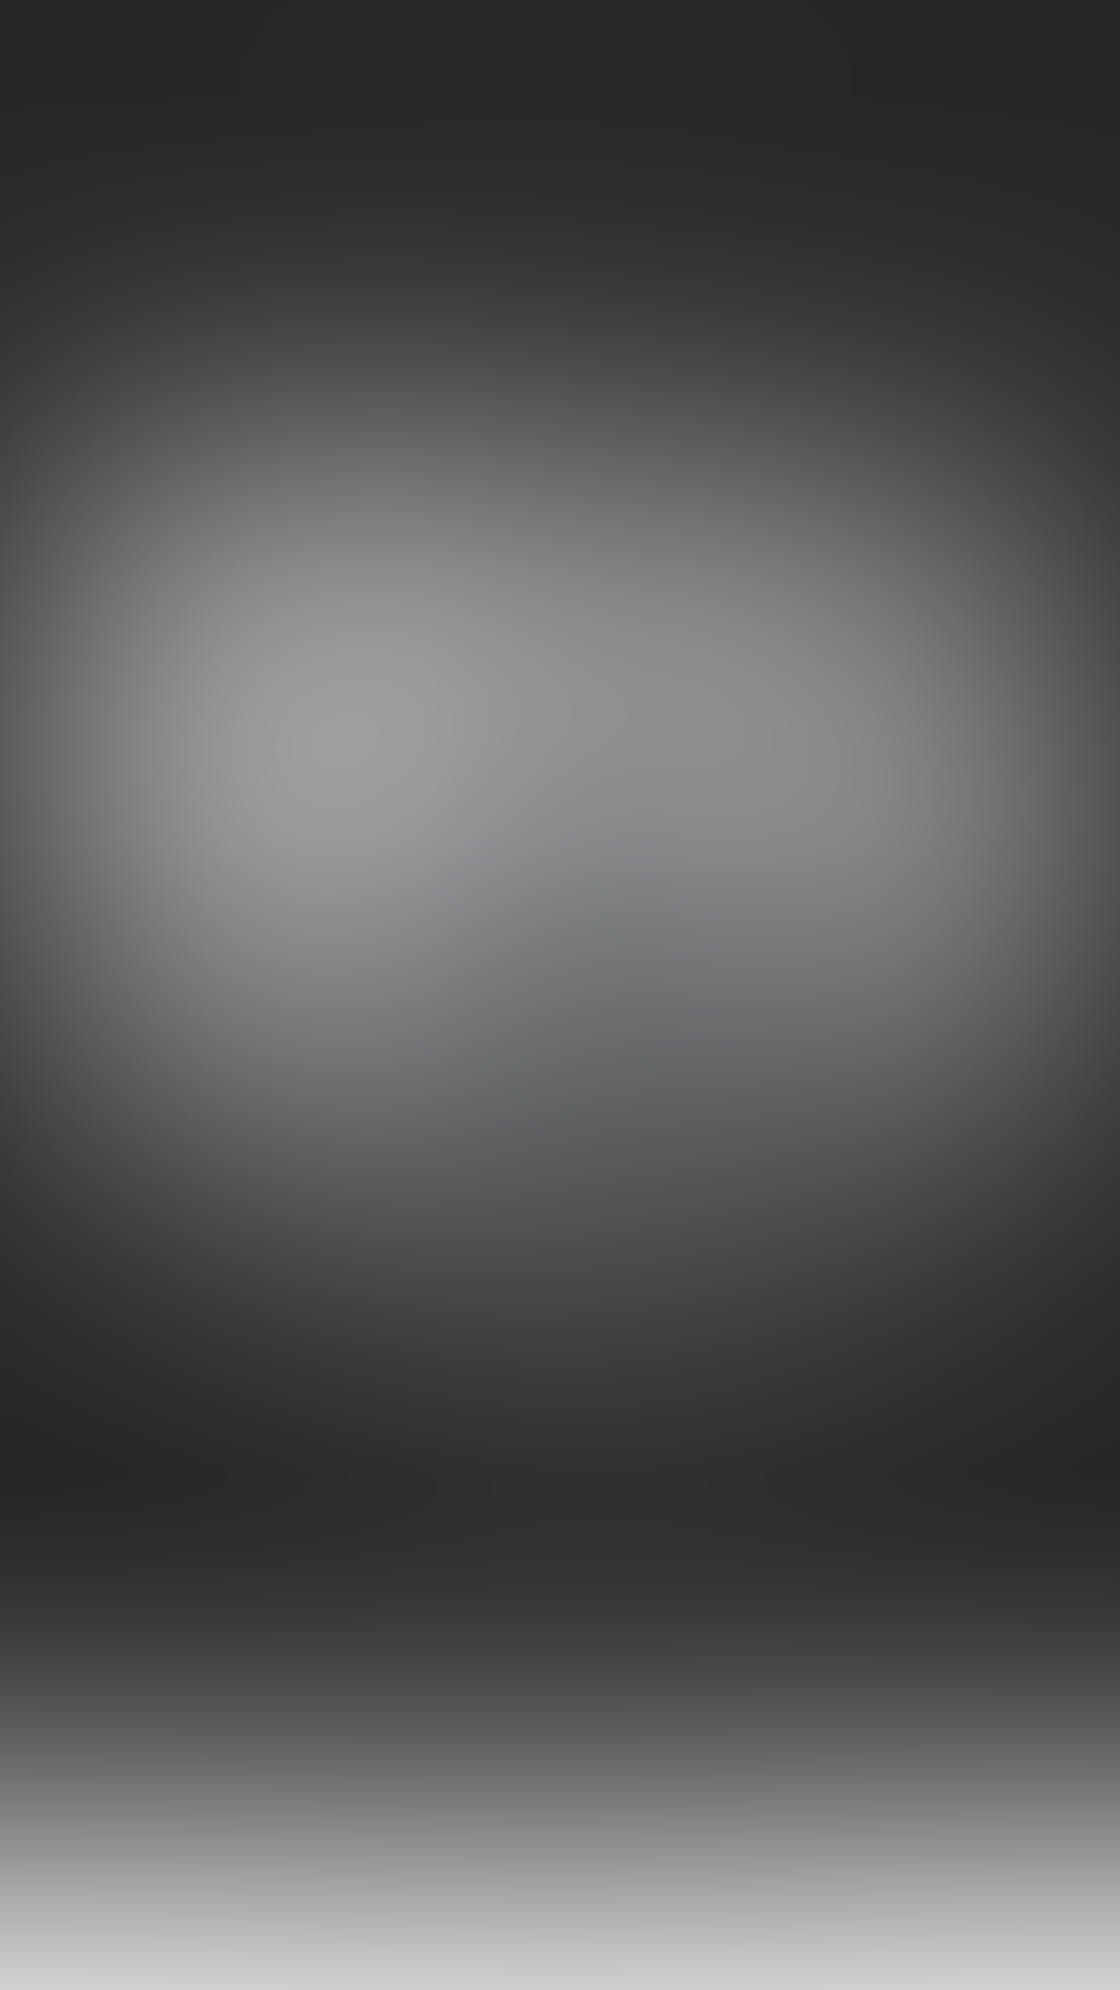 iPhone Photo Vignette 1